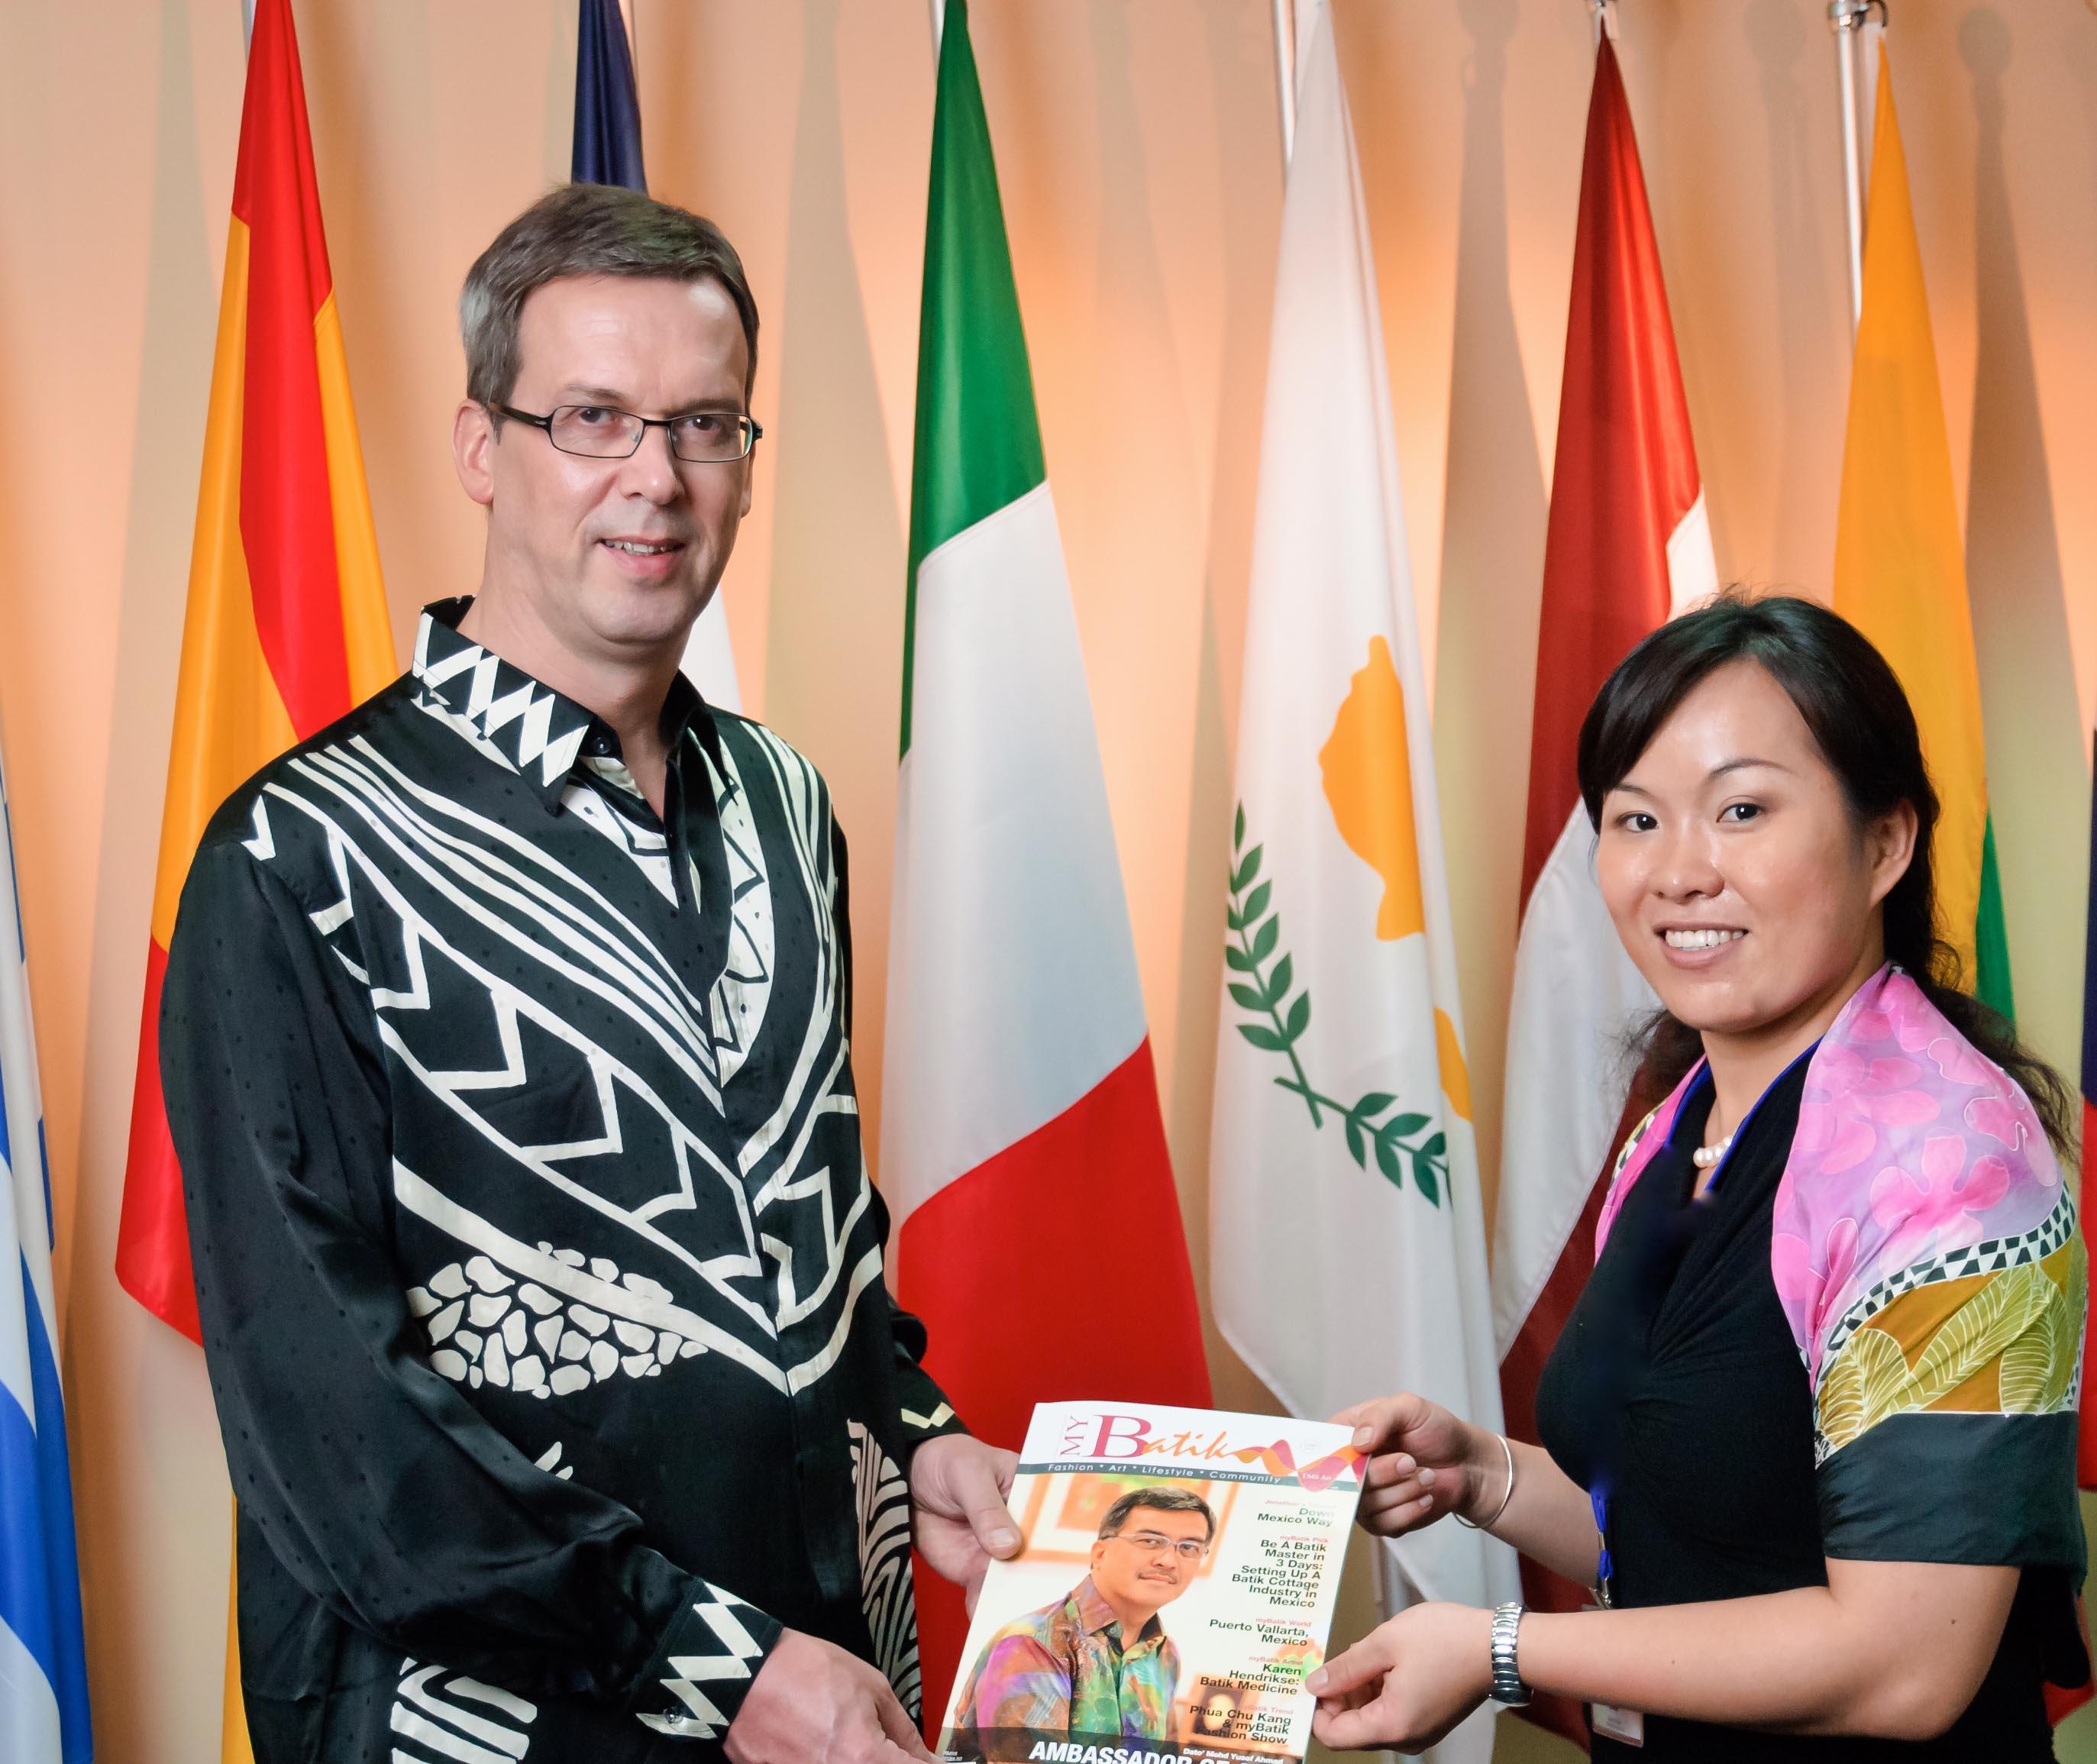 HE Vincent Piket, ambassador of European Union, Malaysia